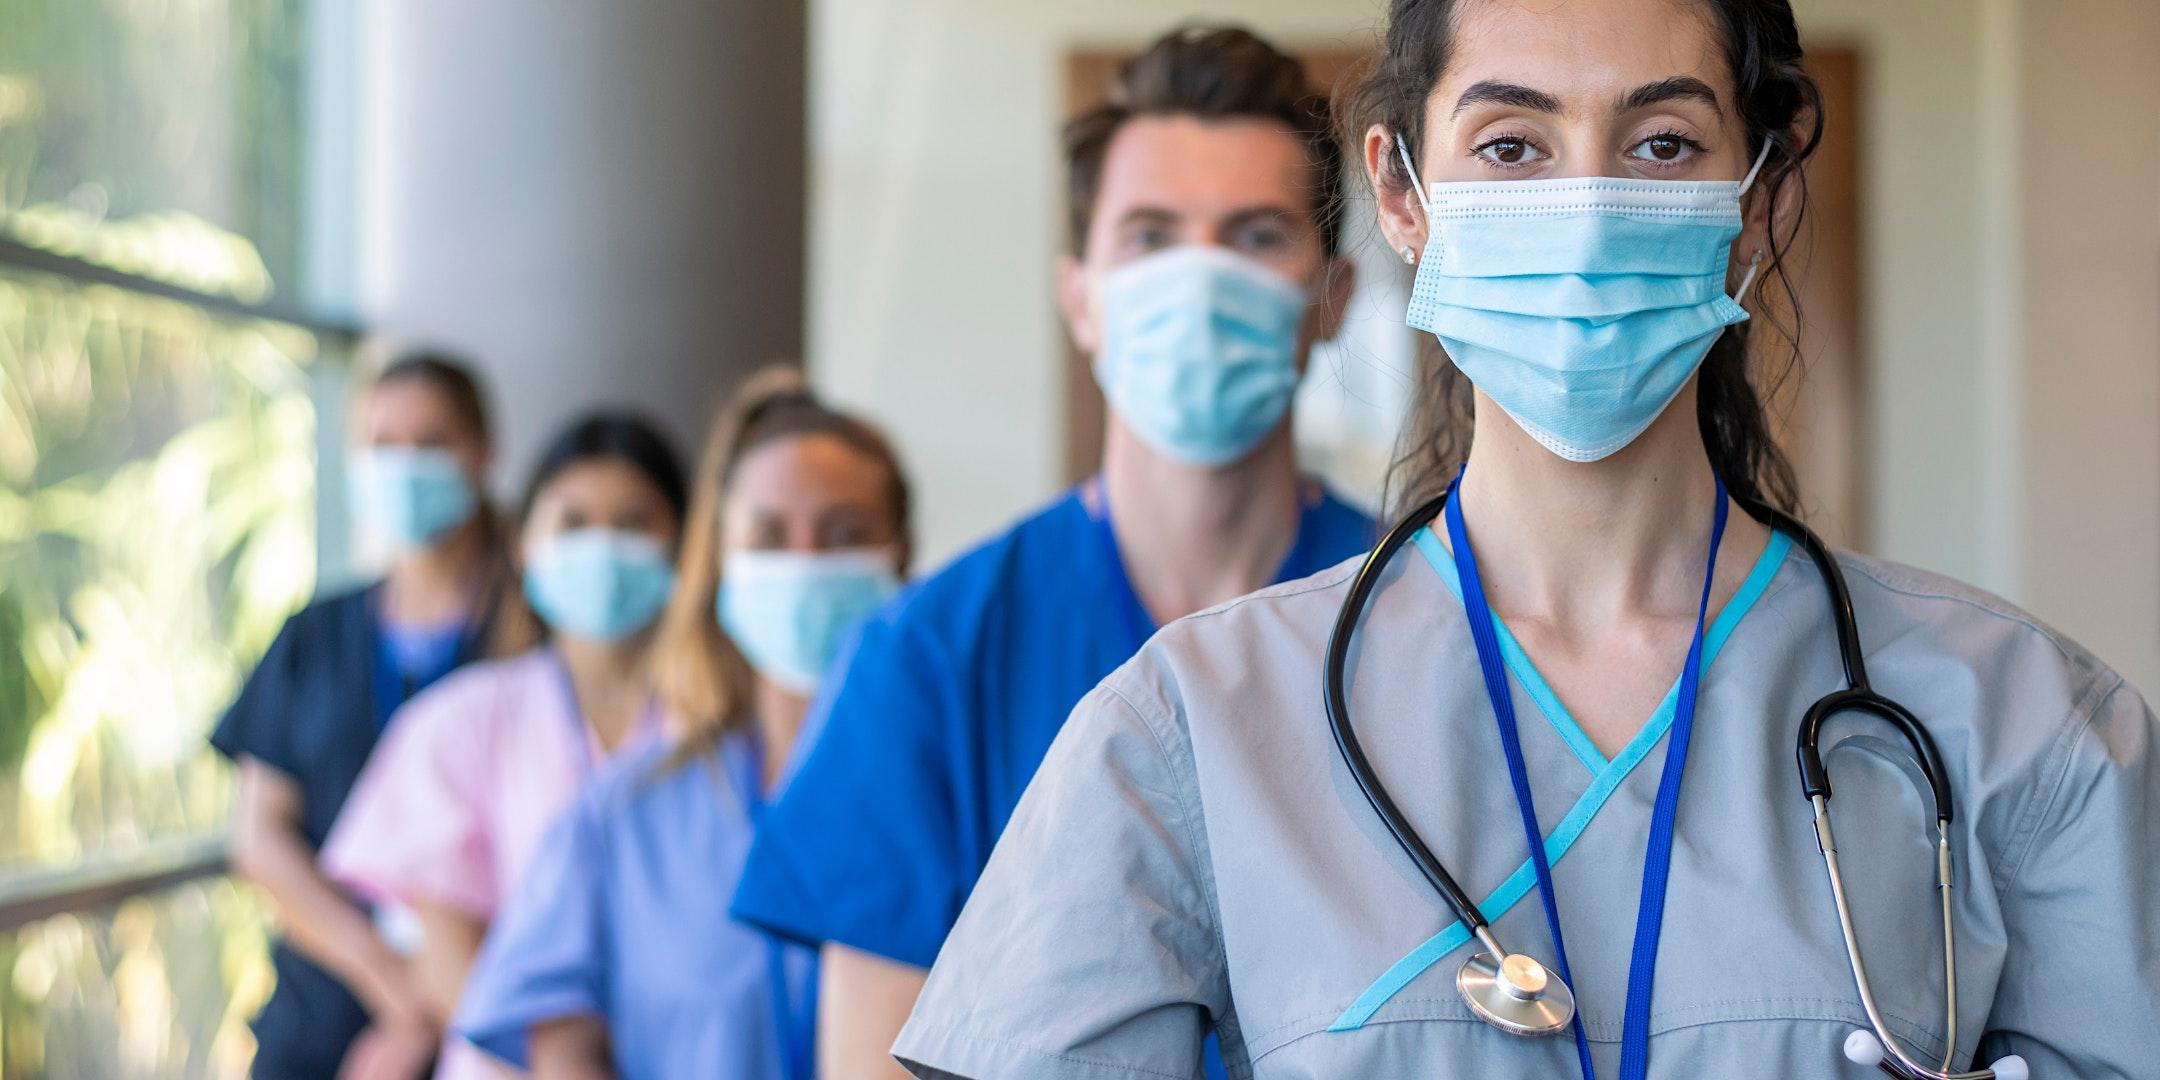 HIRING EVENT - Ellen Sagar Nursing Center, Union, SC